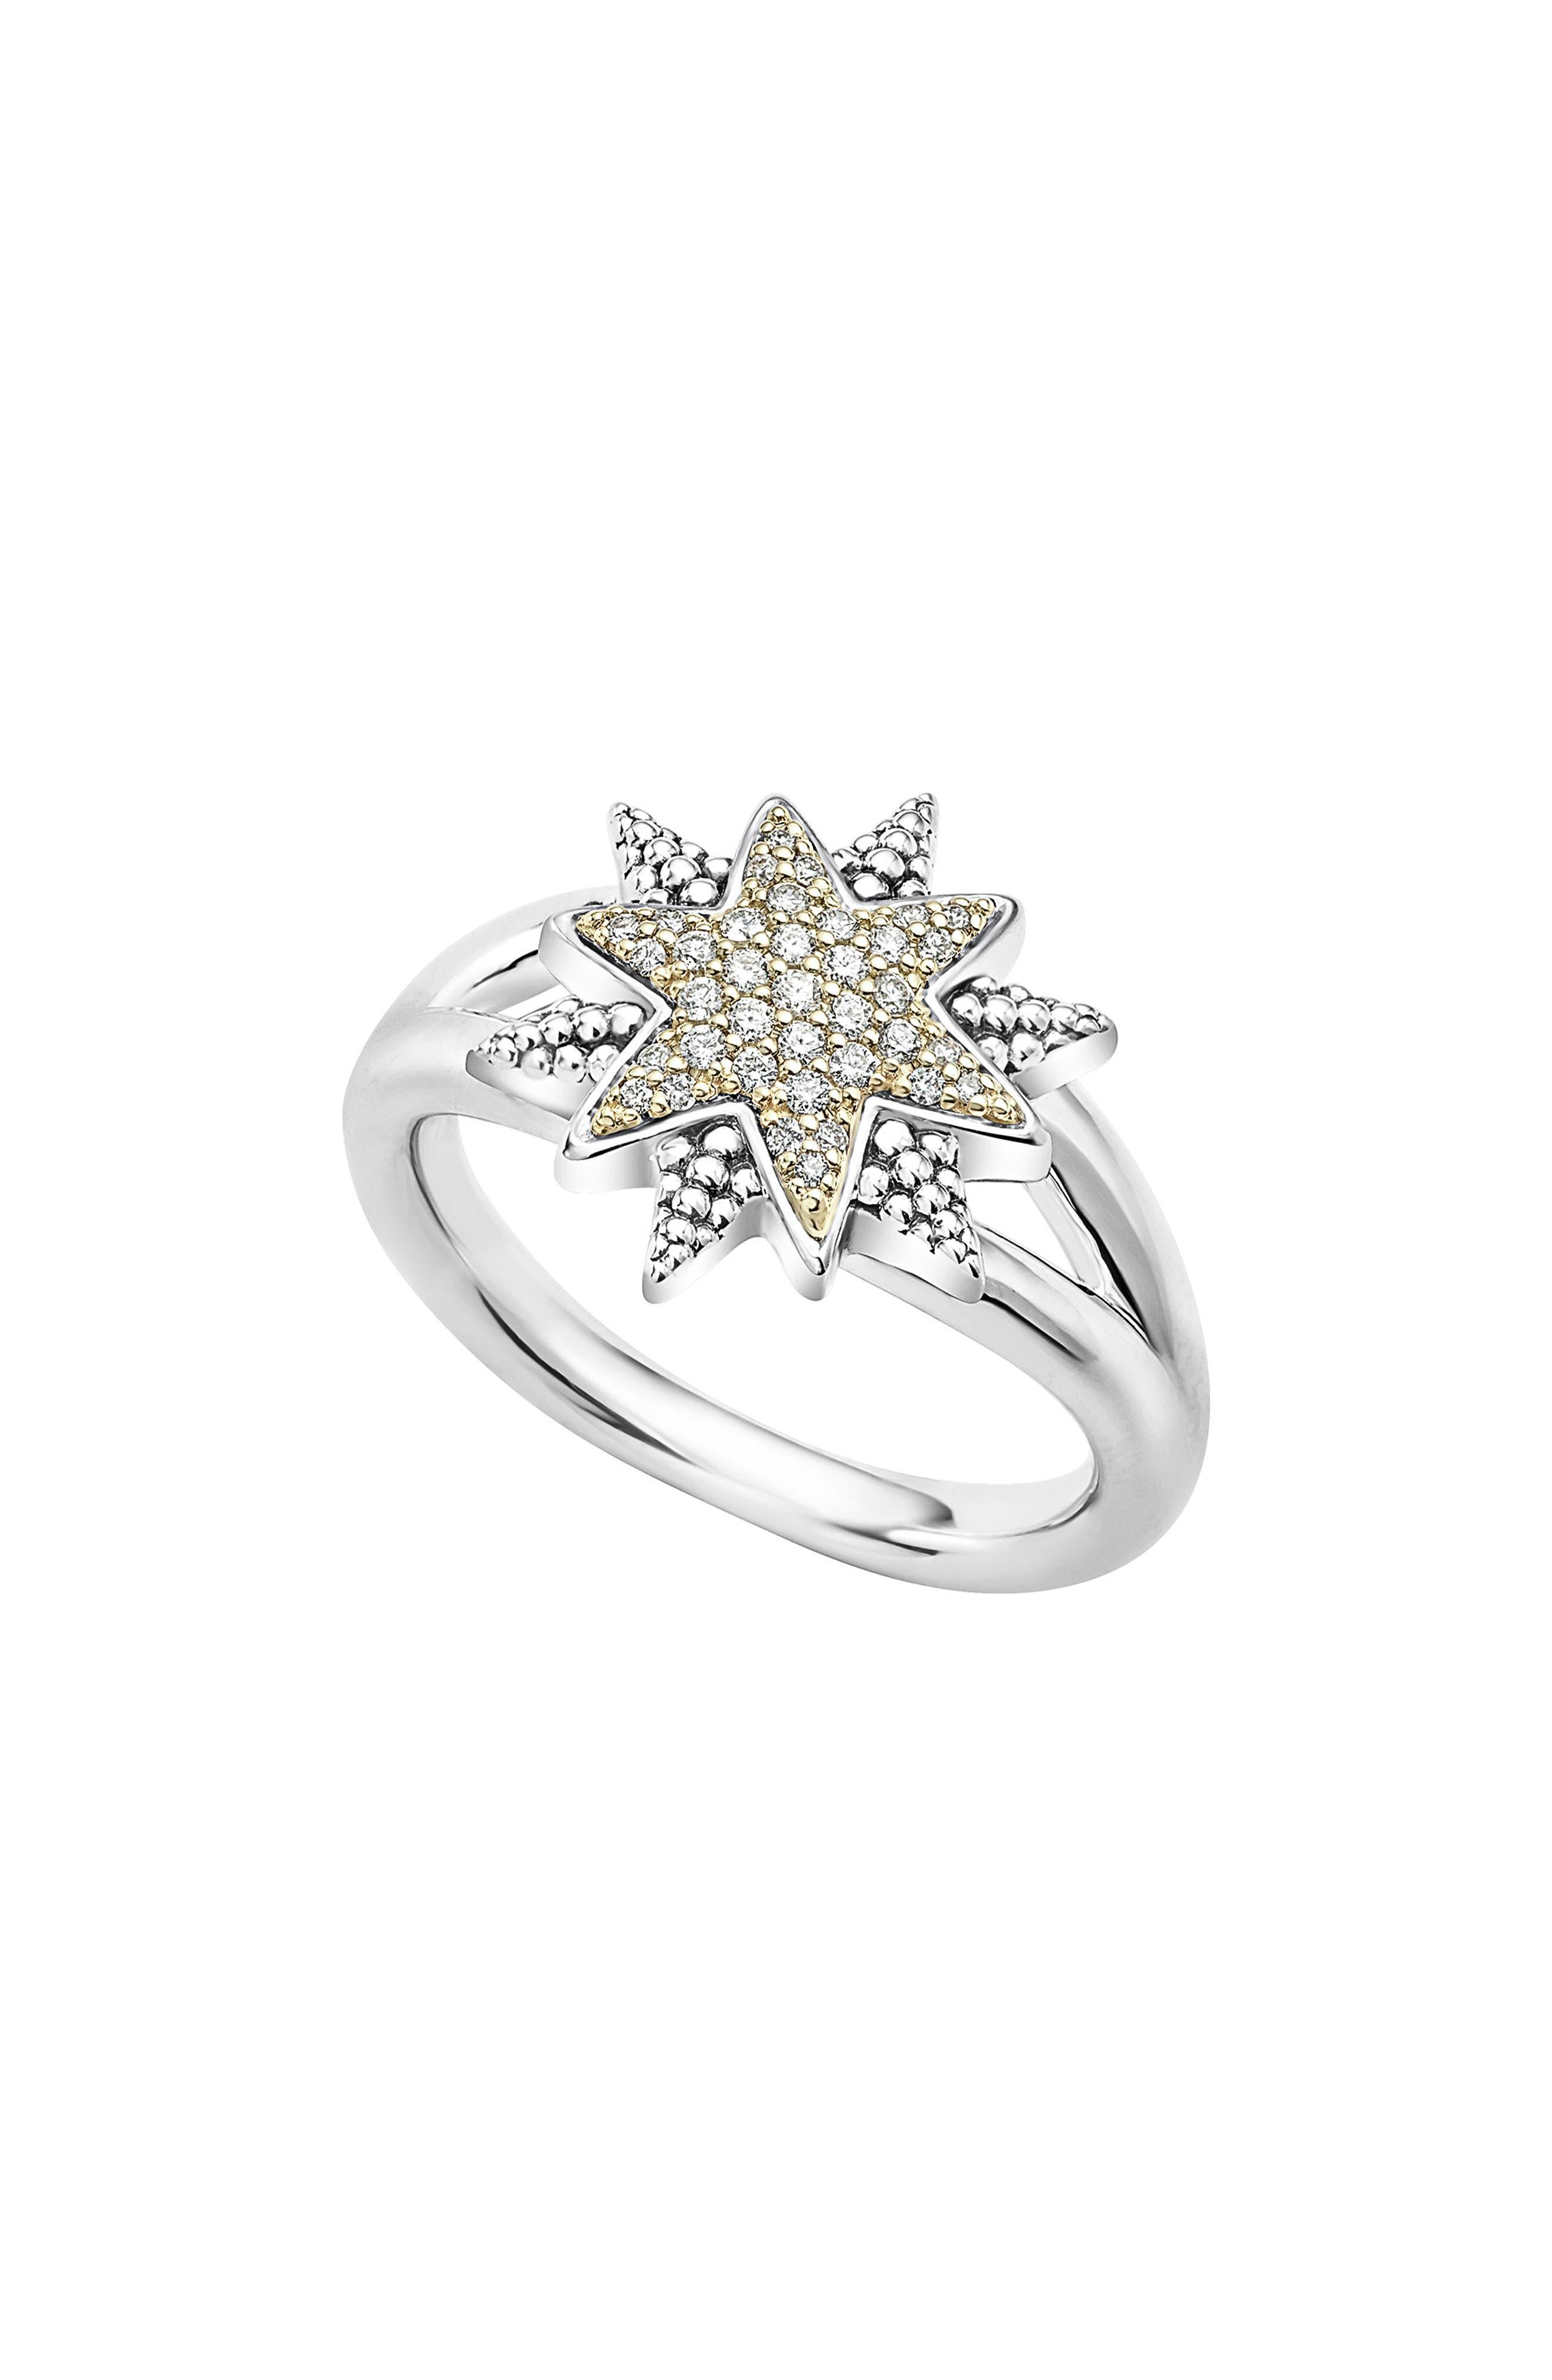 North Star Ring,                         Main,                         color, Diamond